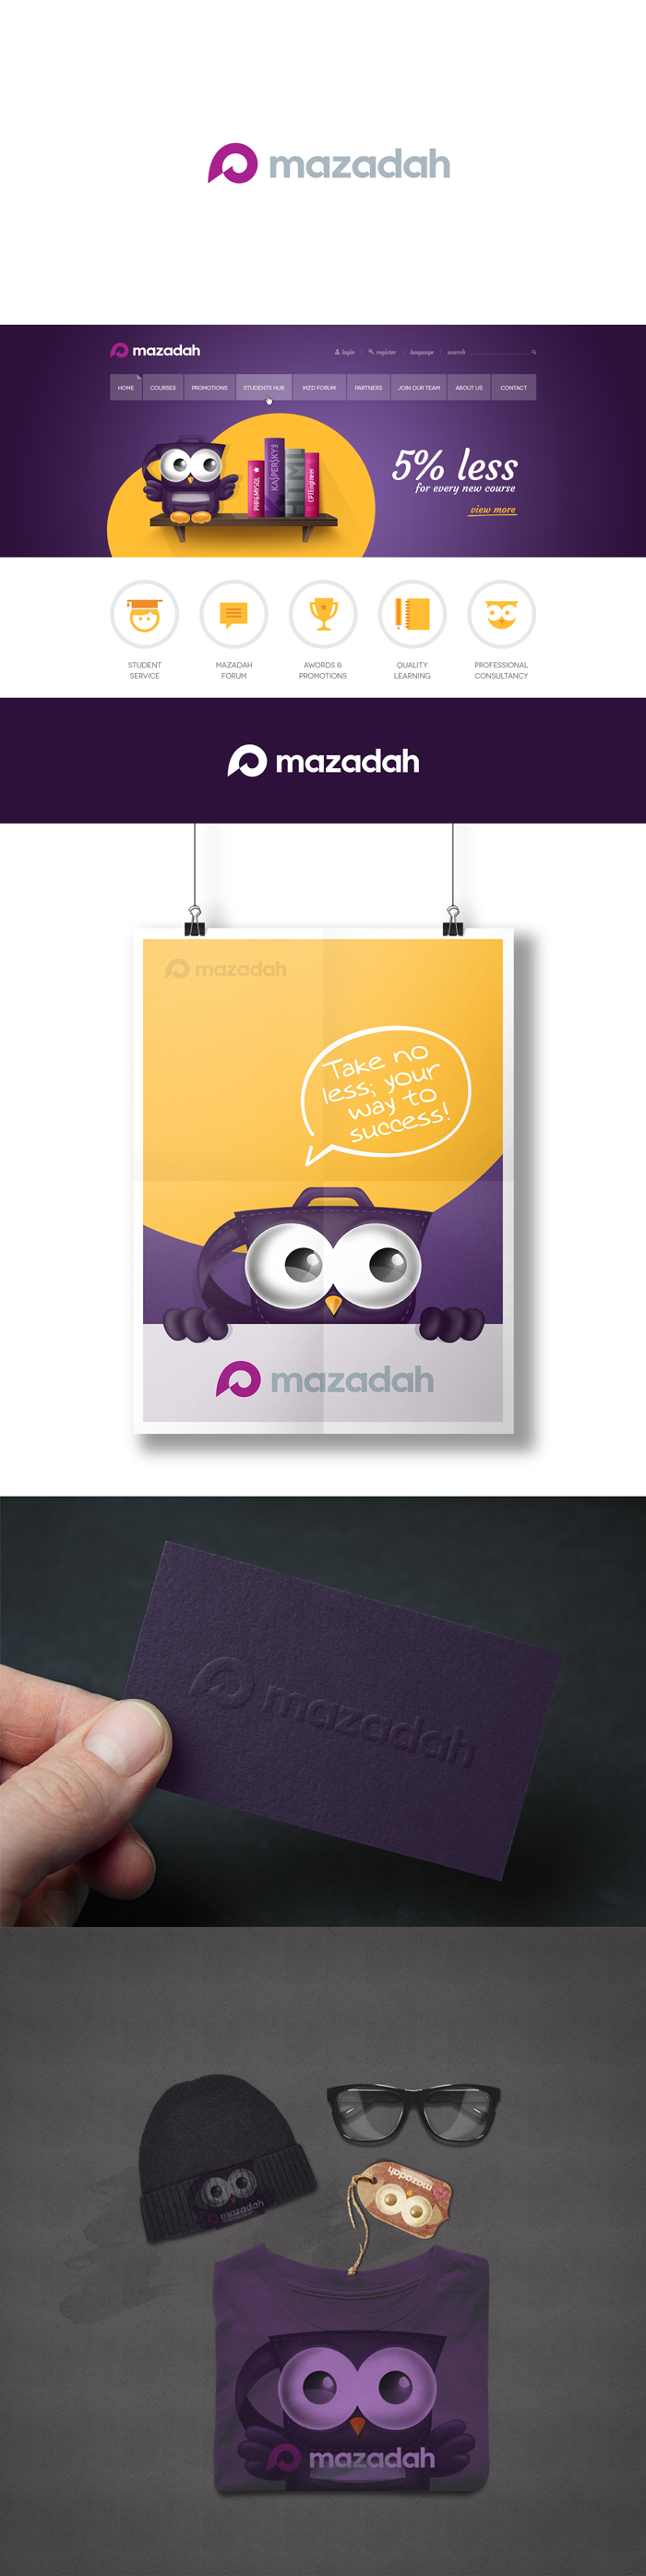 Mazadah-preview